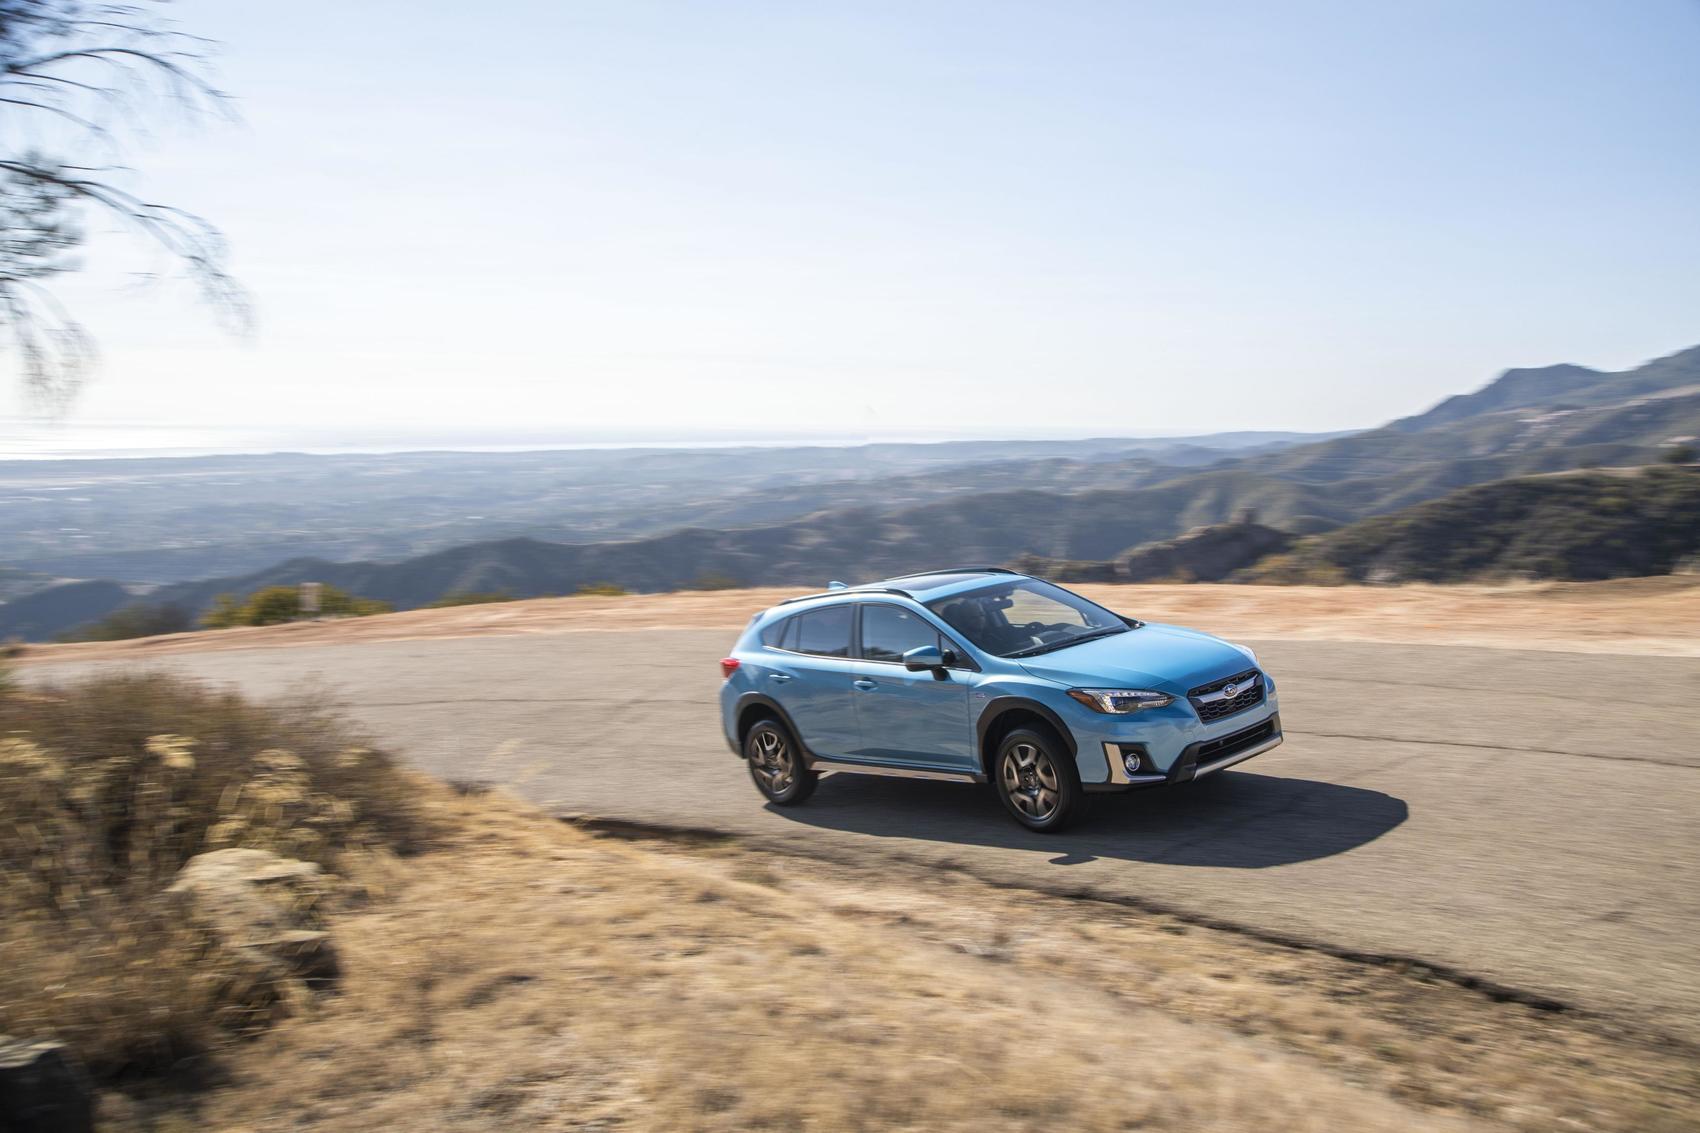 2019 Subaru Crosstrek Hybrid Space Age Technology Logical